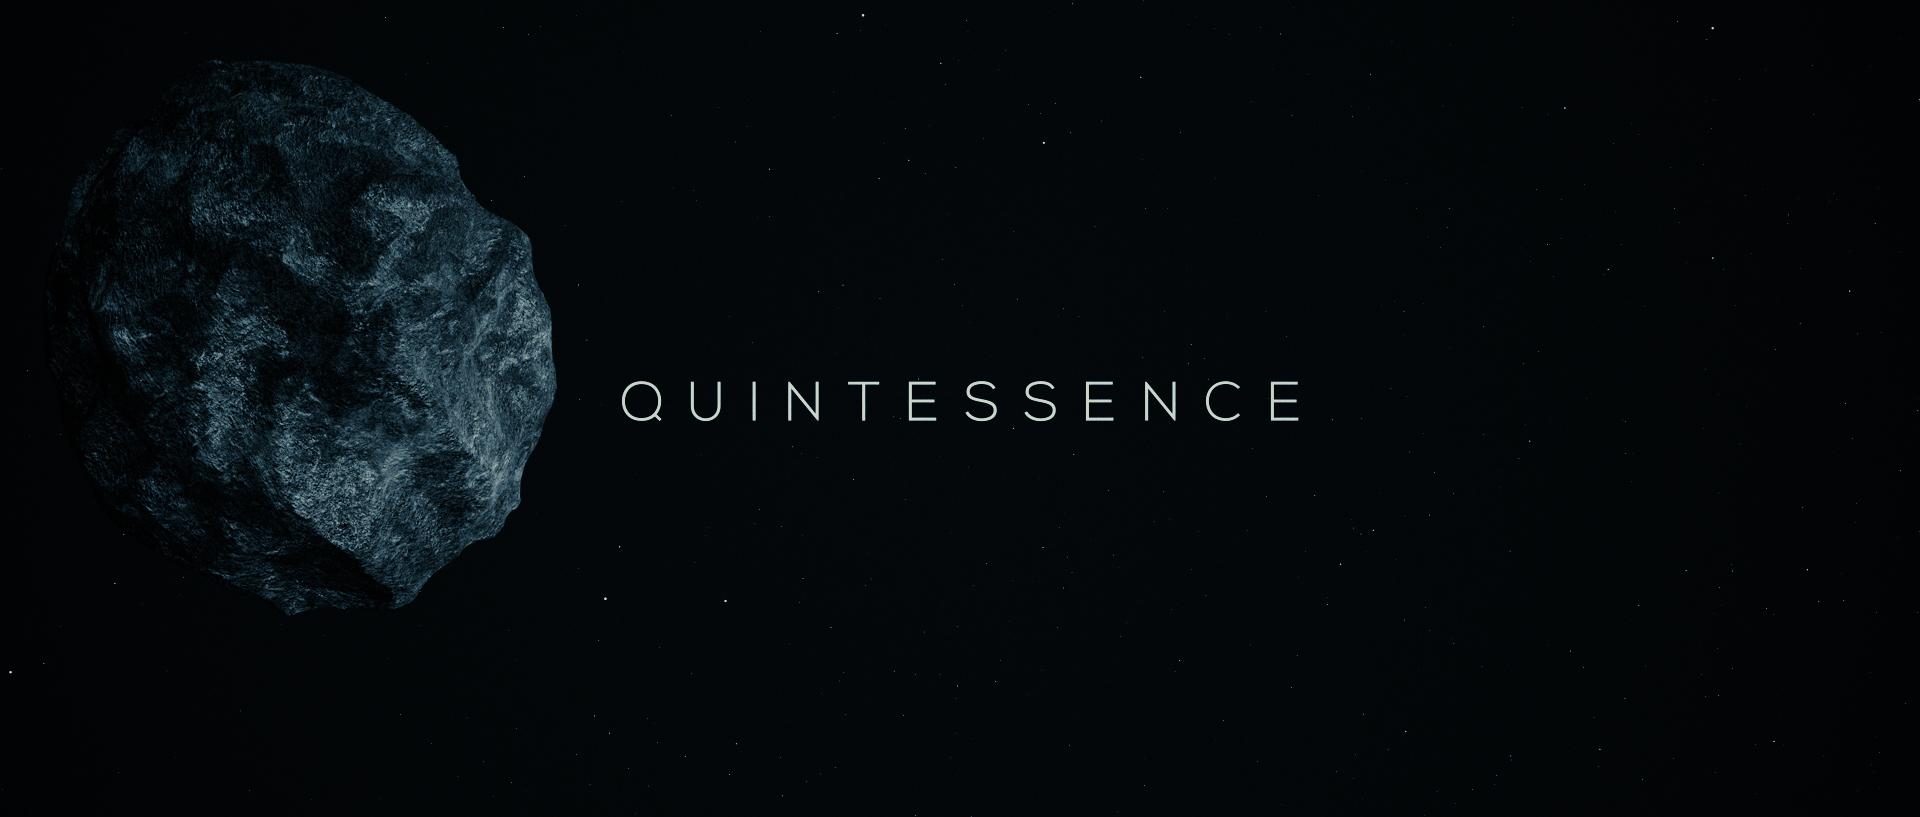 Quintessence00.png